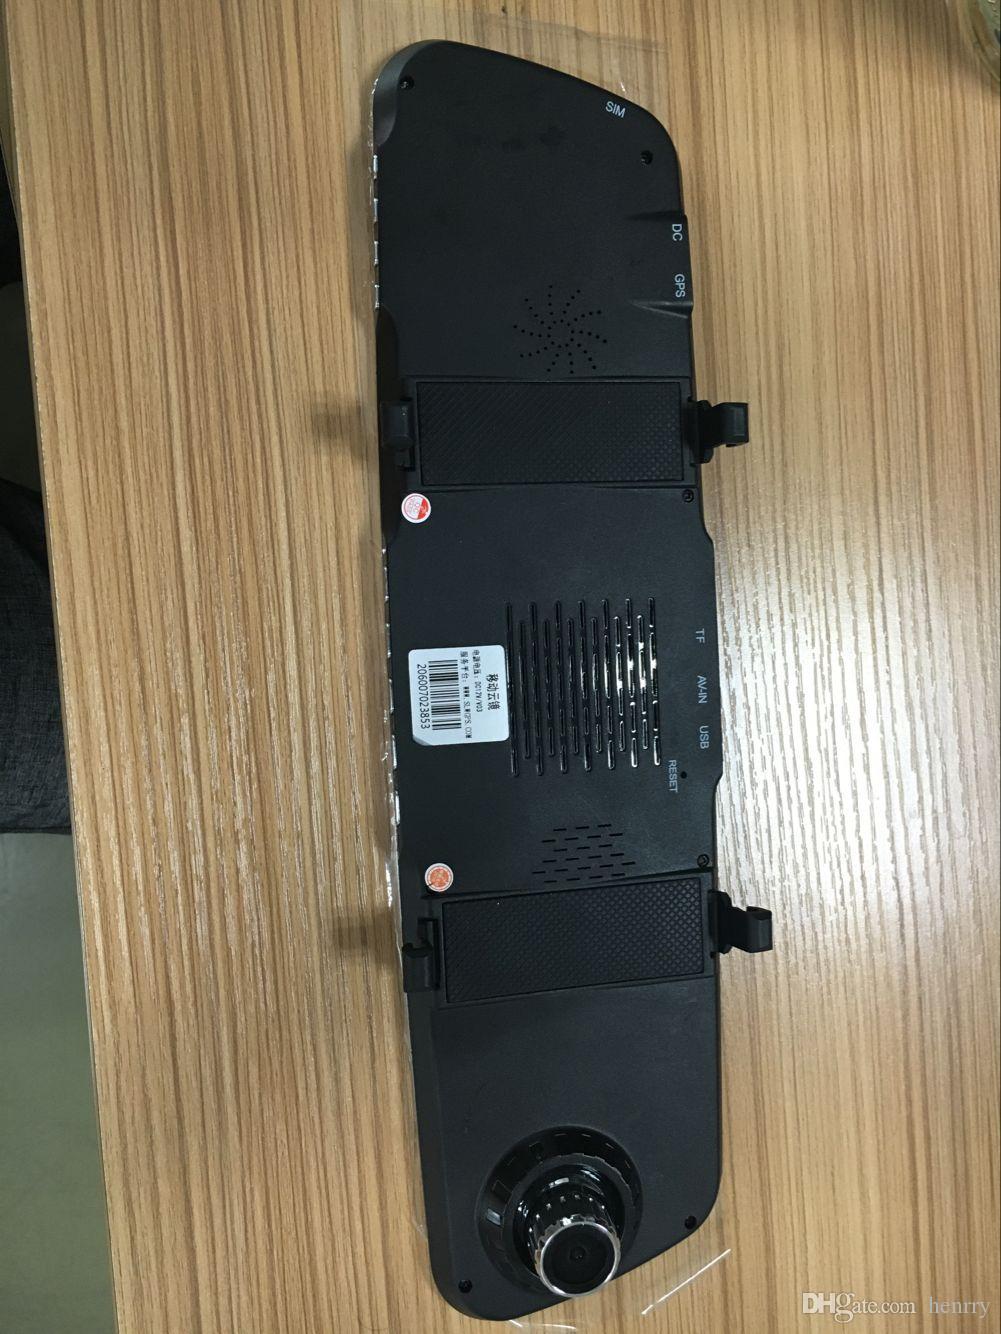 FHD Dual Camera Car DVR 4.3 Inch Dash Cam PZ905A Bluetooth Night Vision Pip Loop Recording VMD Parking Monitoring G Sensor EMS